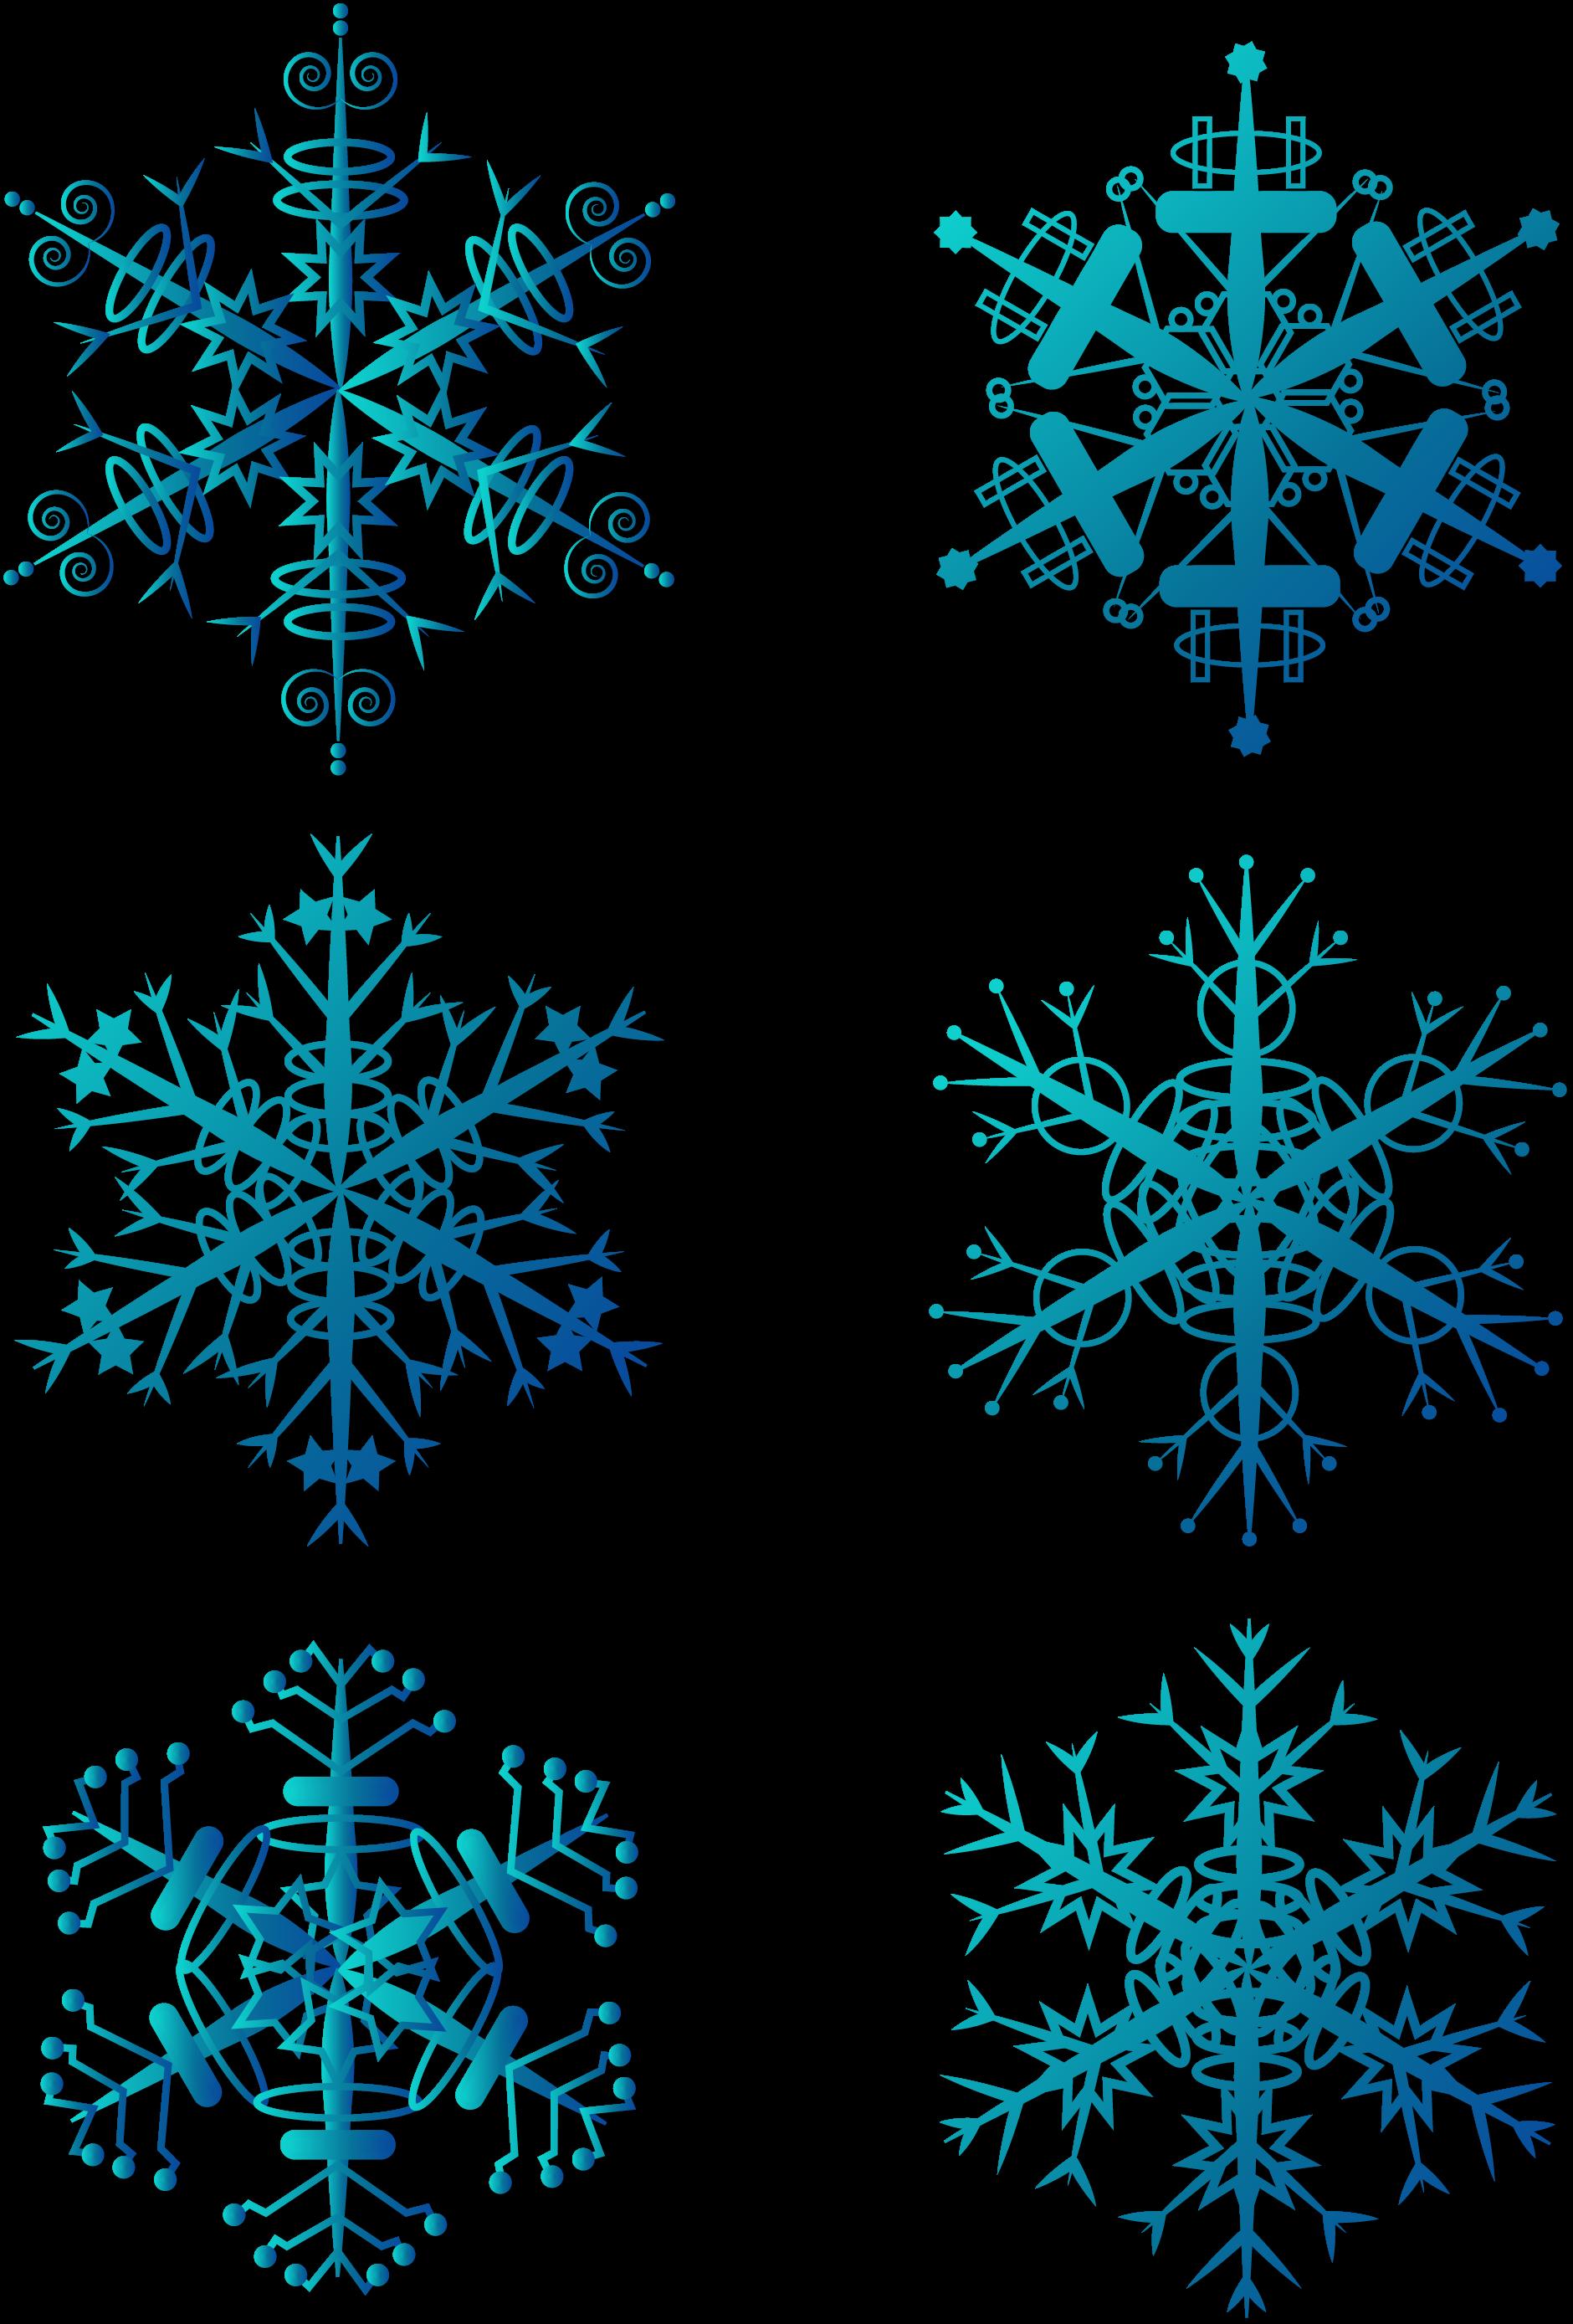 Winter Snowflakes Blue Christmas Snowflake Decorations.